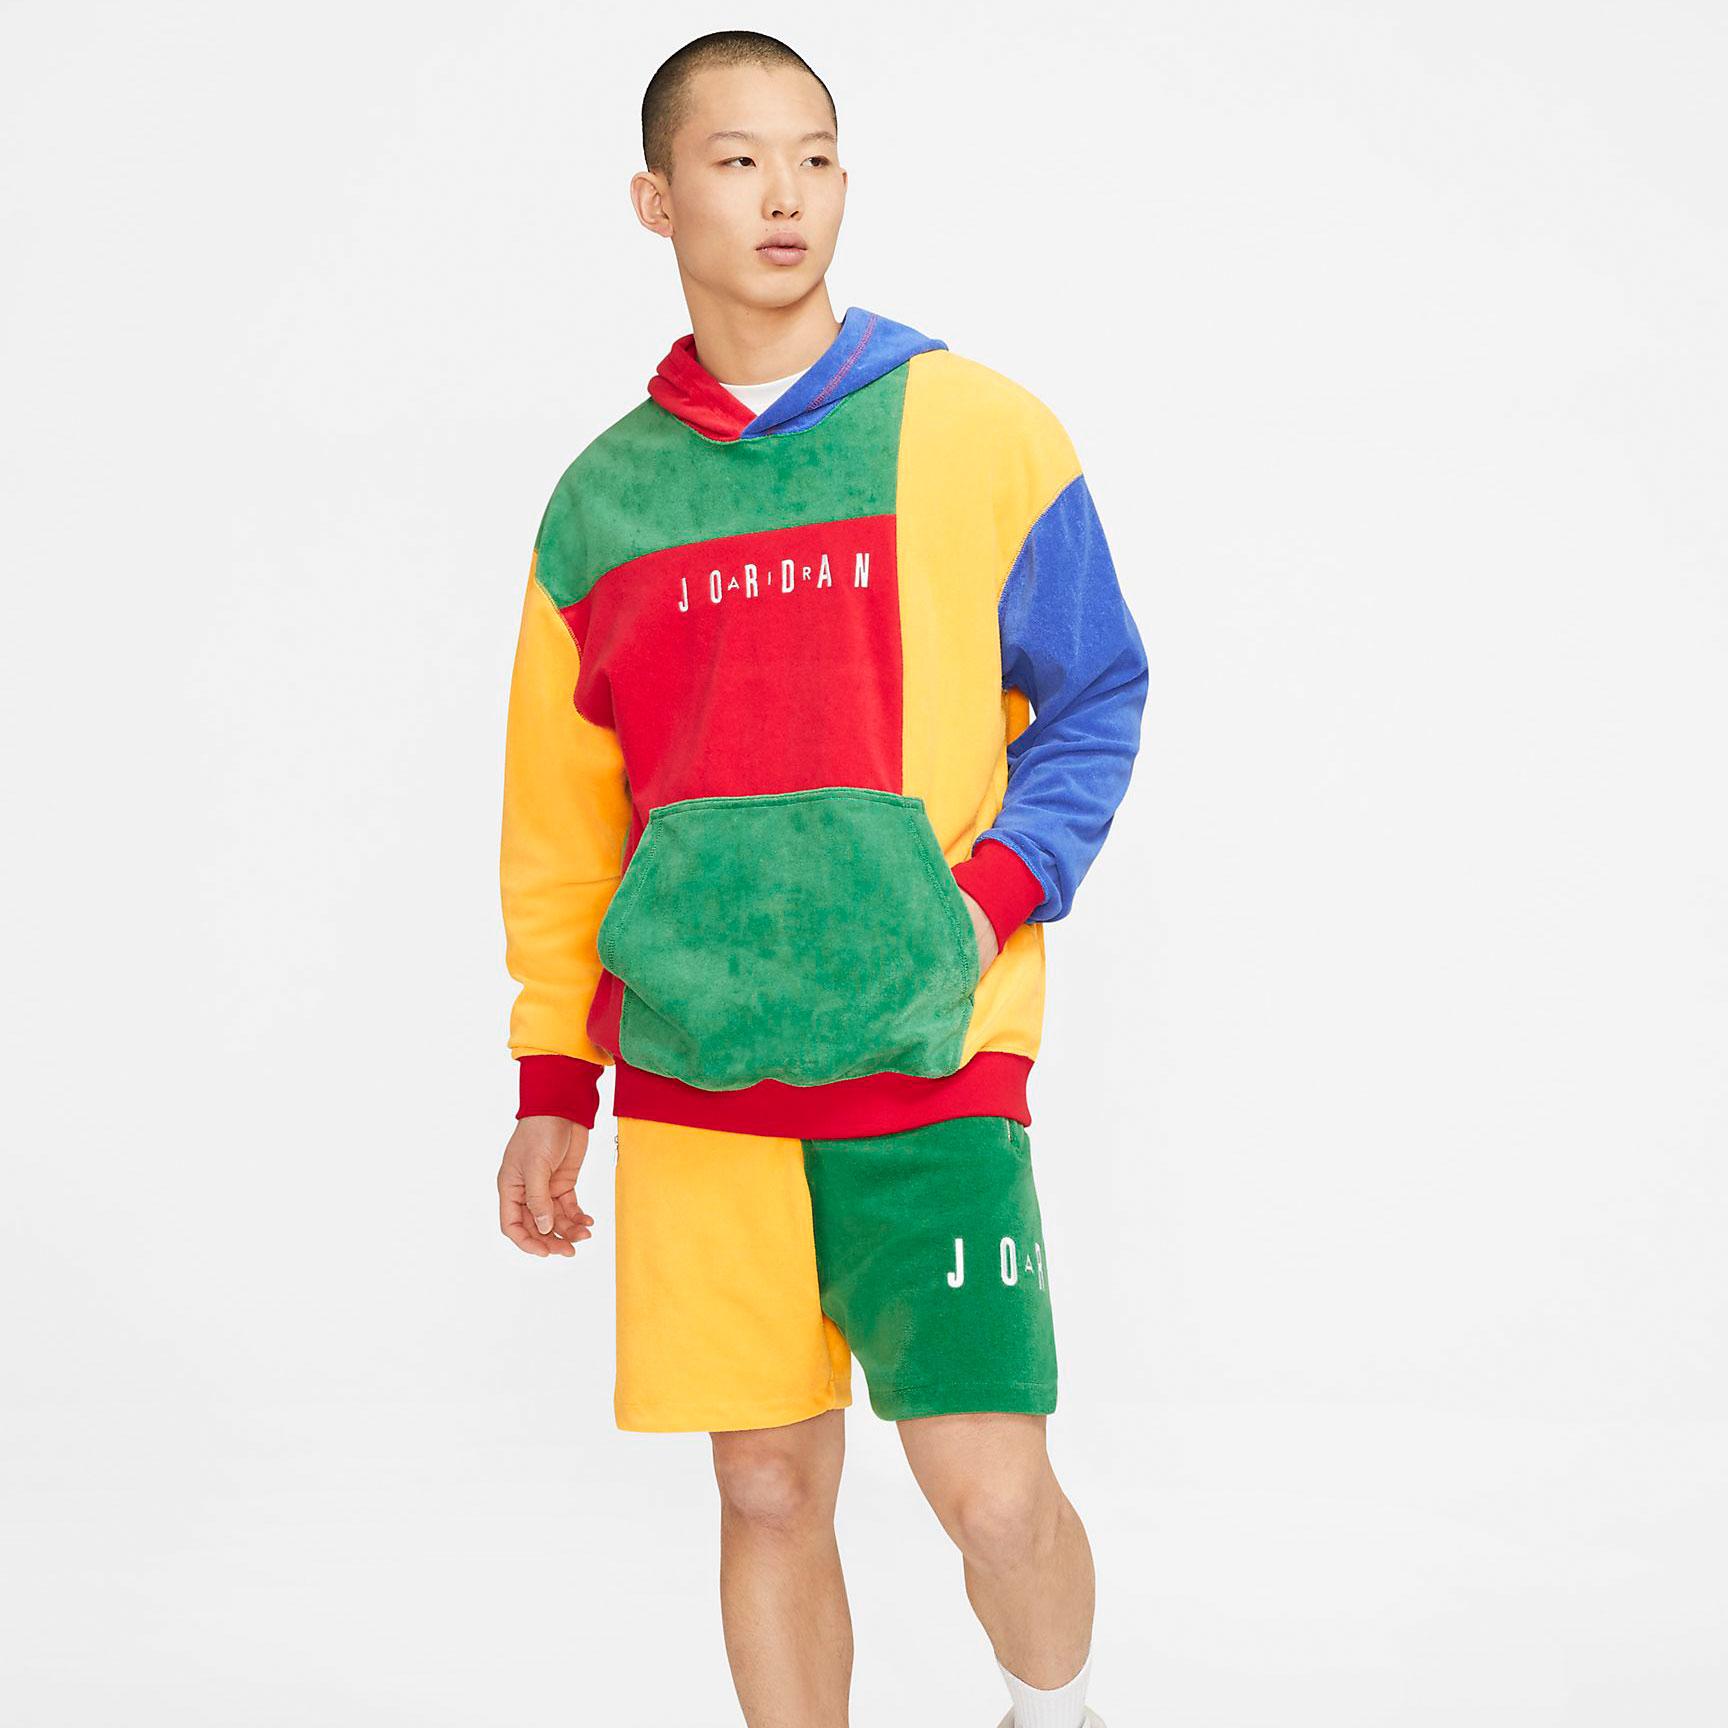 hare-jordan-6-hoodie-shorts-sneaker-outfit